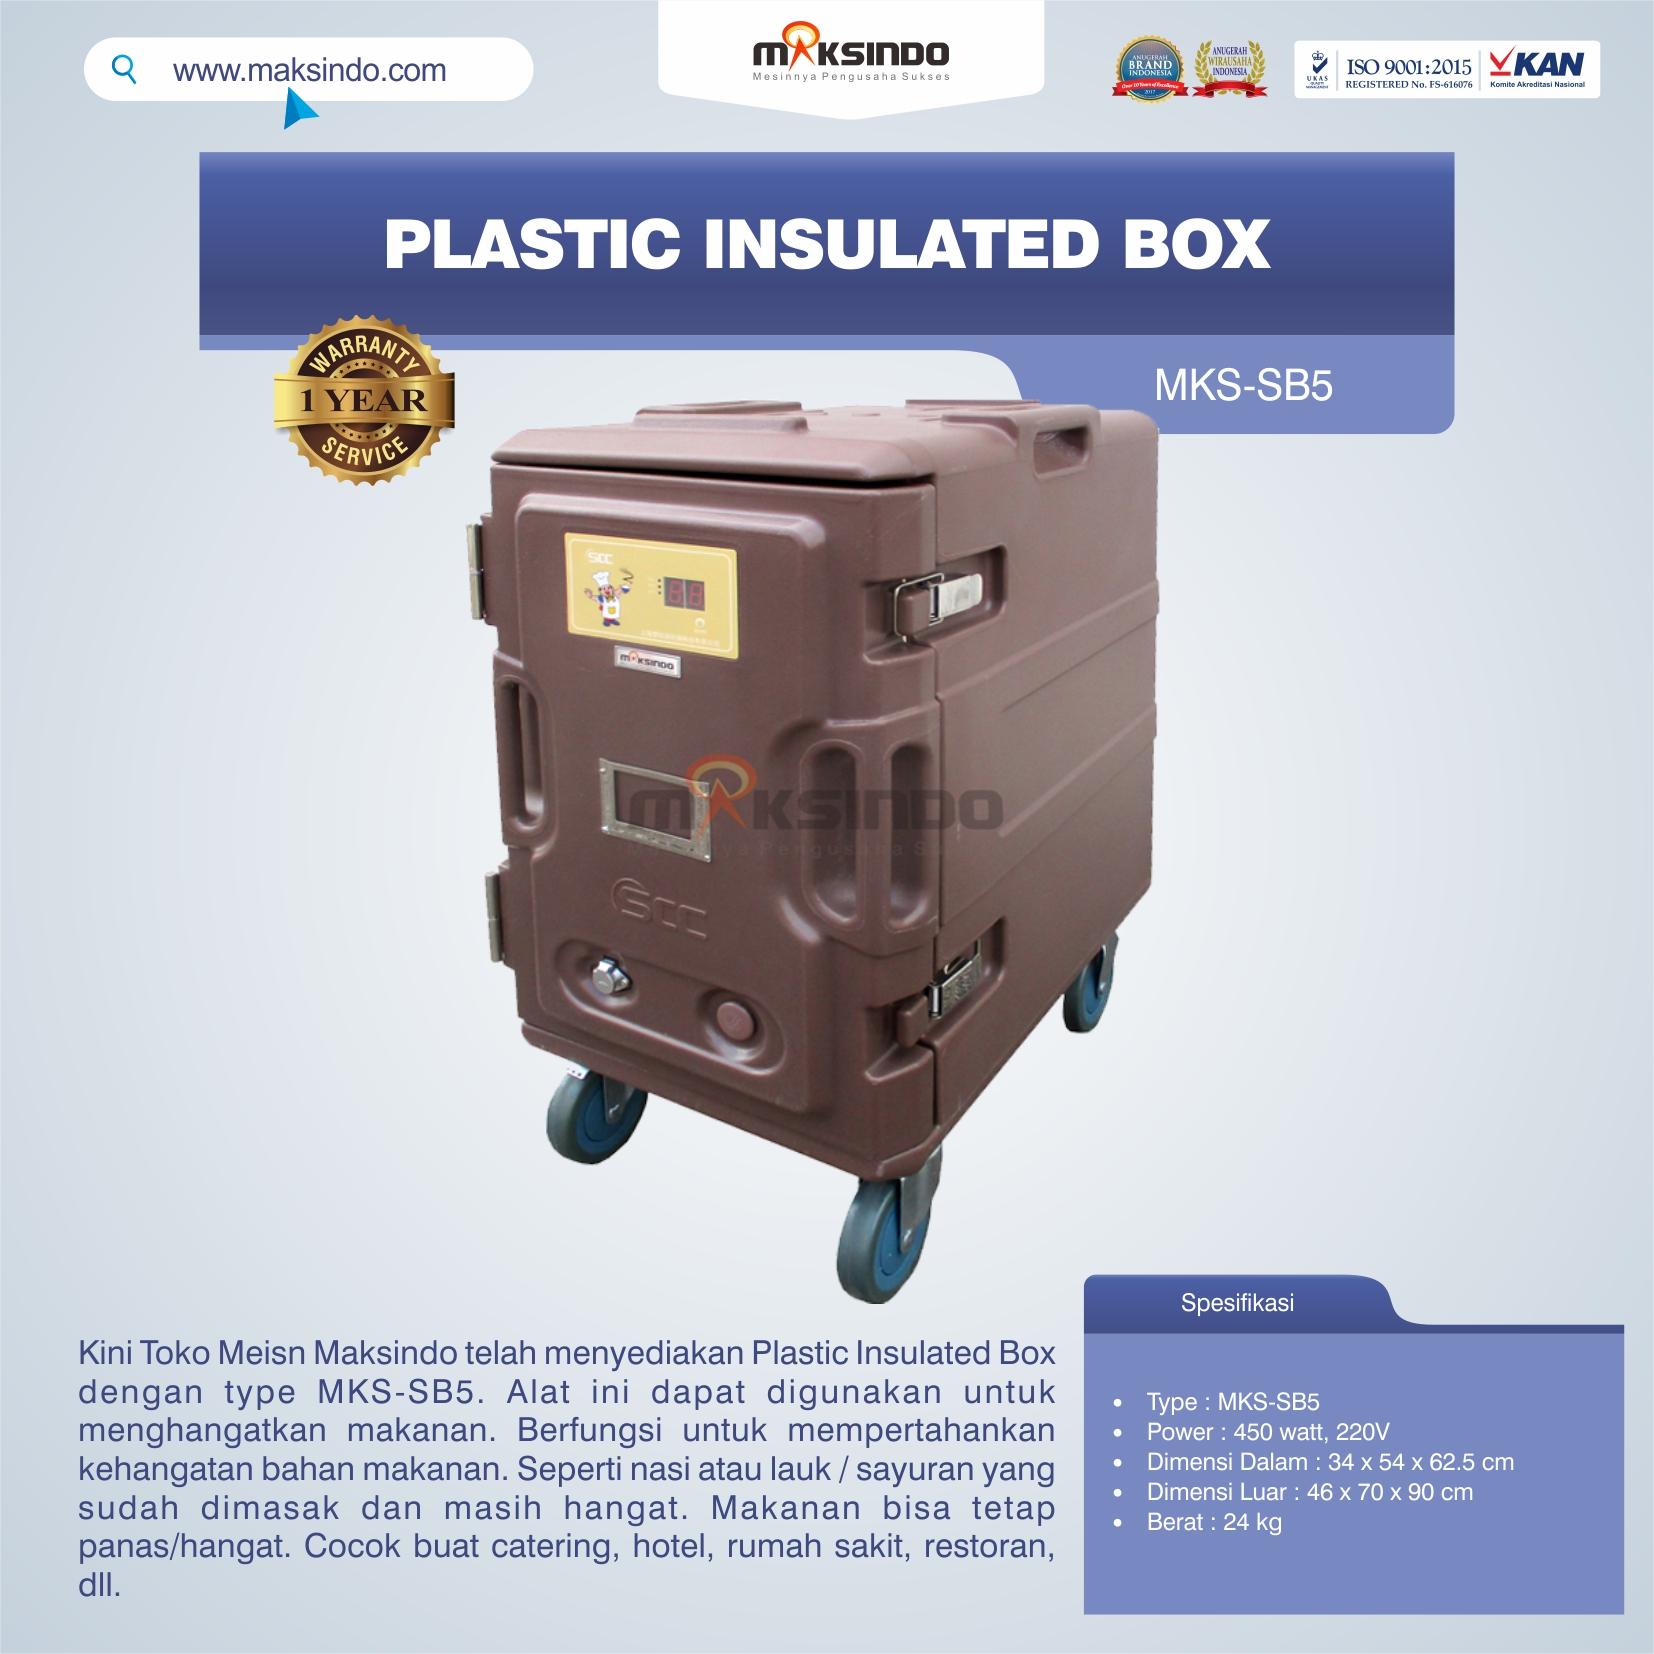 Jual Plastic Insulated Box MKS-SB5 di Bogor